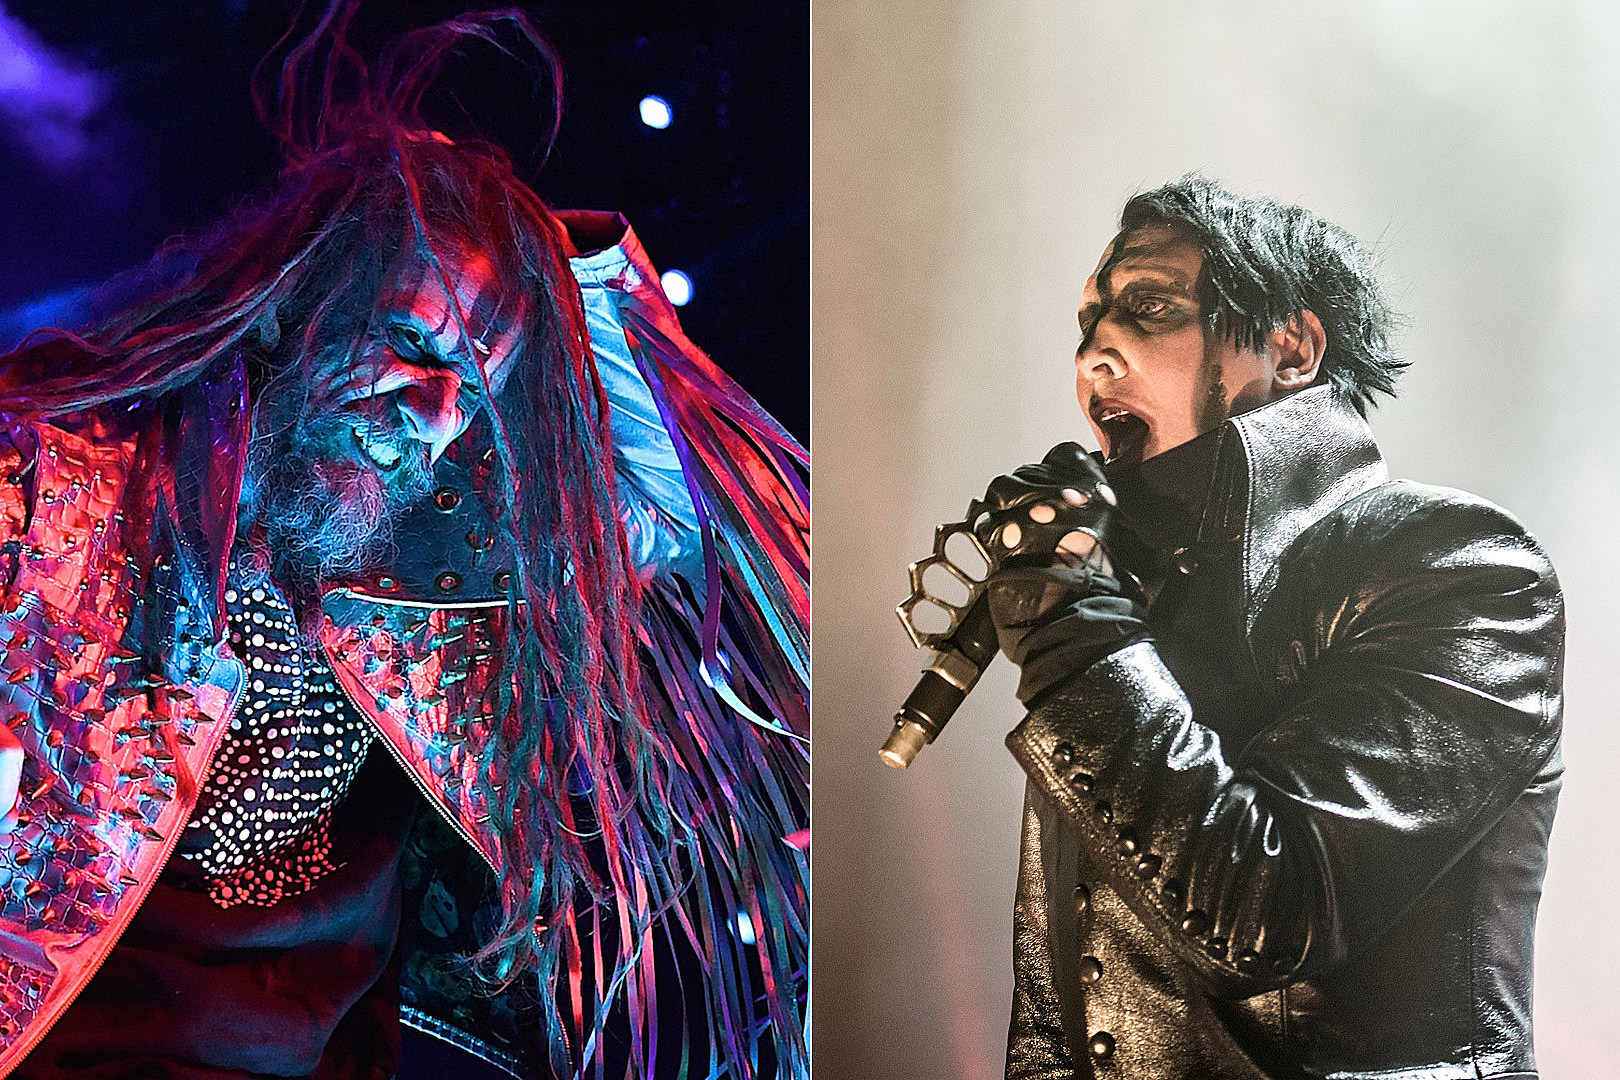 Rob Zombie + Marilyn Manson Pre-Sales Begin, Plus News on Underoath, Blessthefall + More